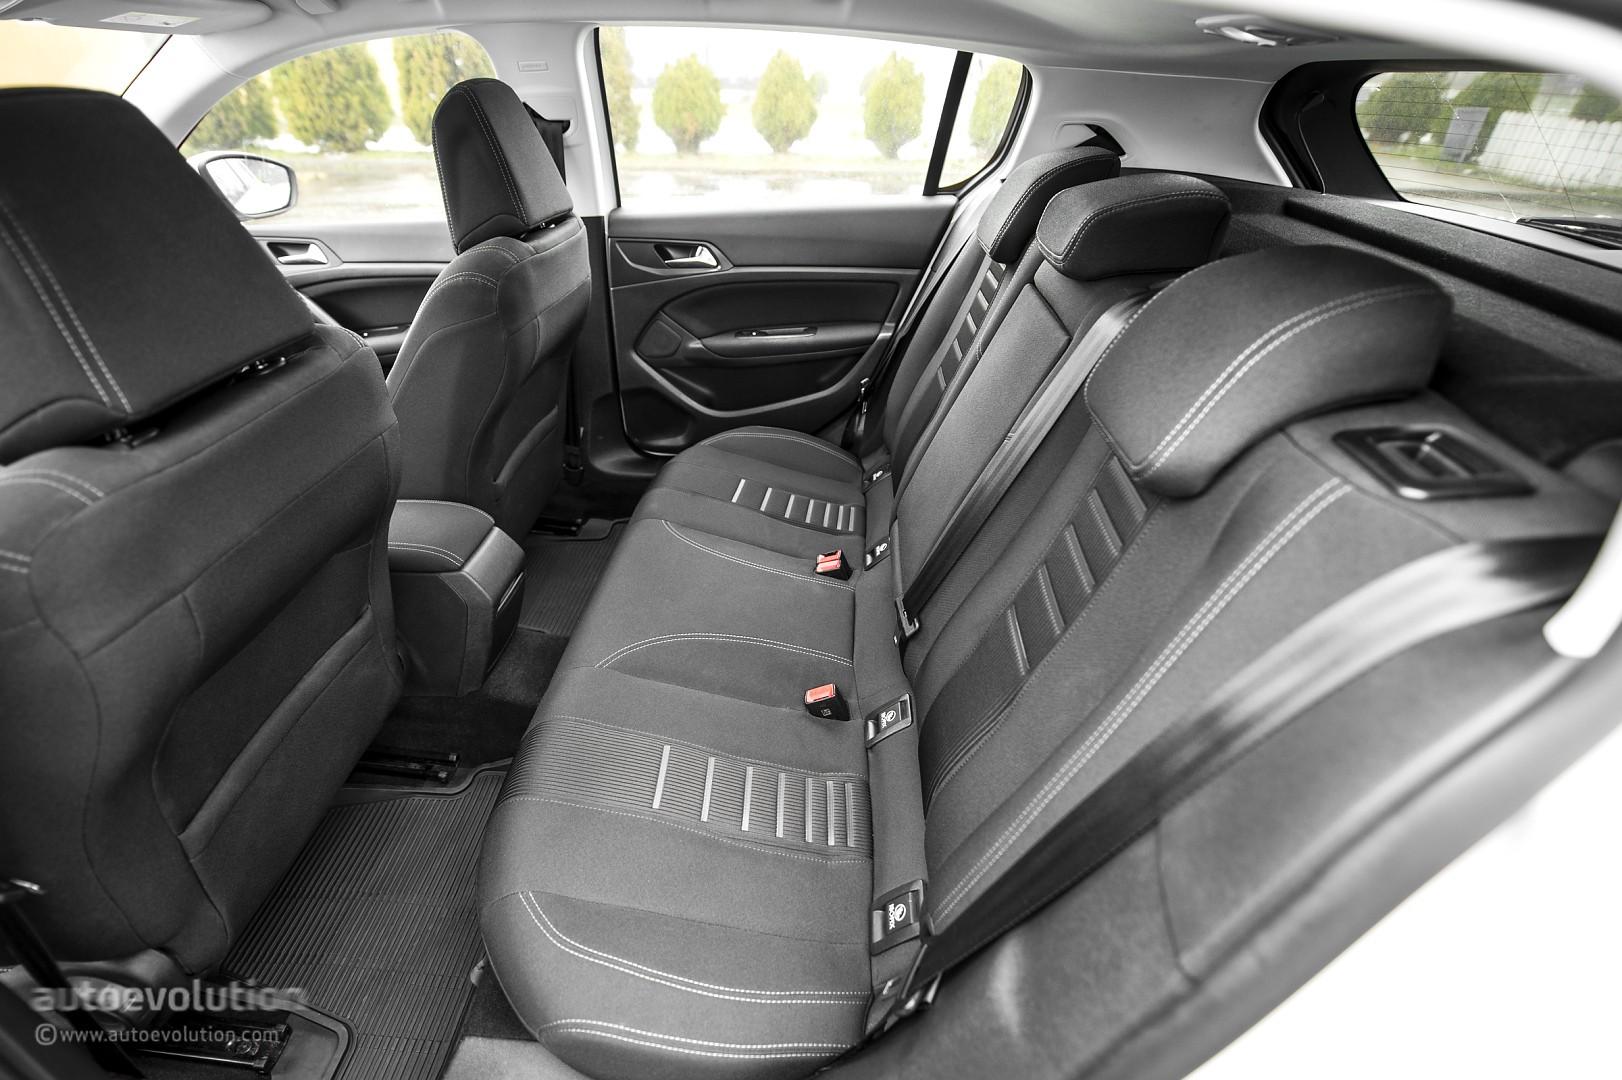 2015 Peugeot 308 Review Autoevolution Fuse Box Cover